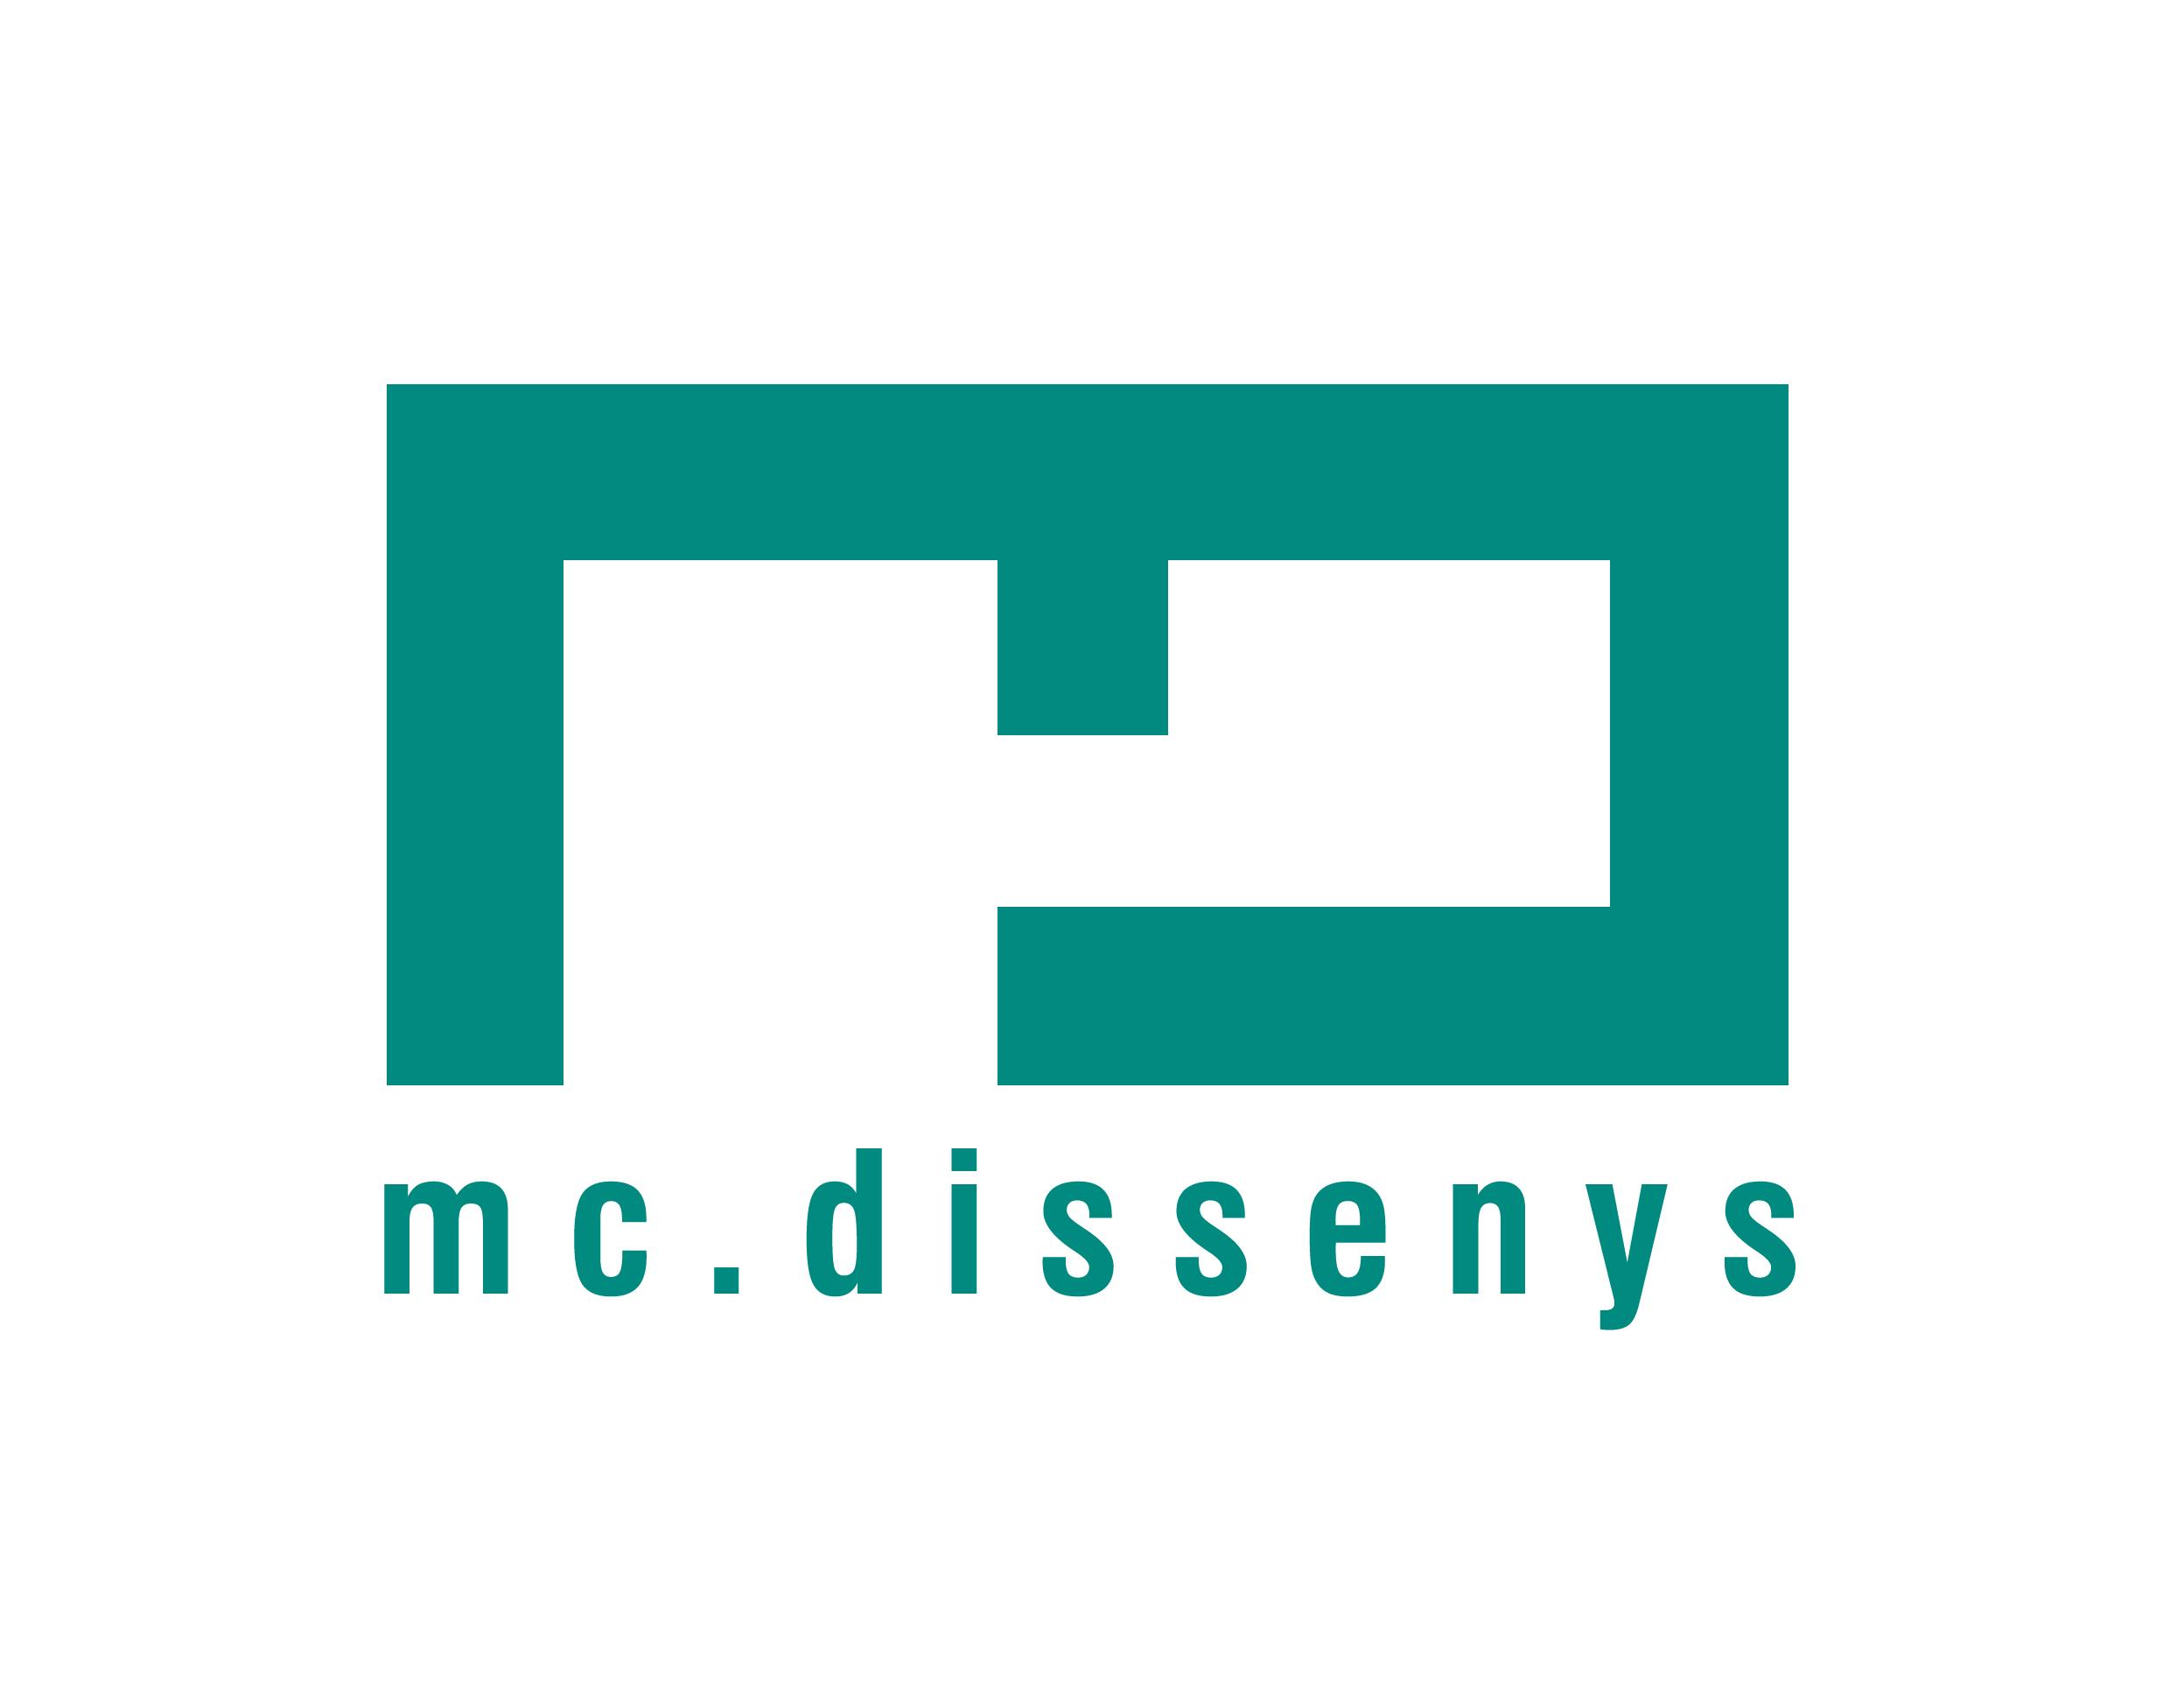 Mc Dissenys